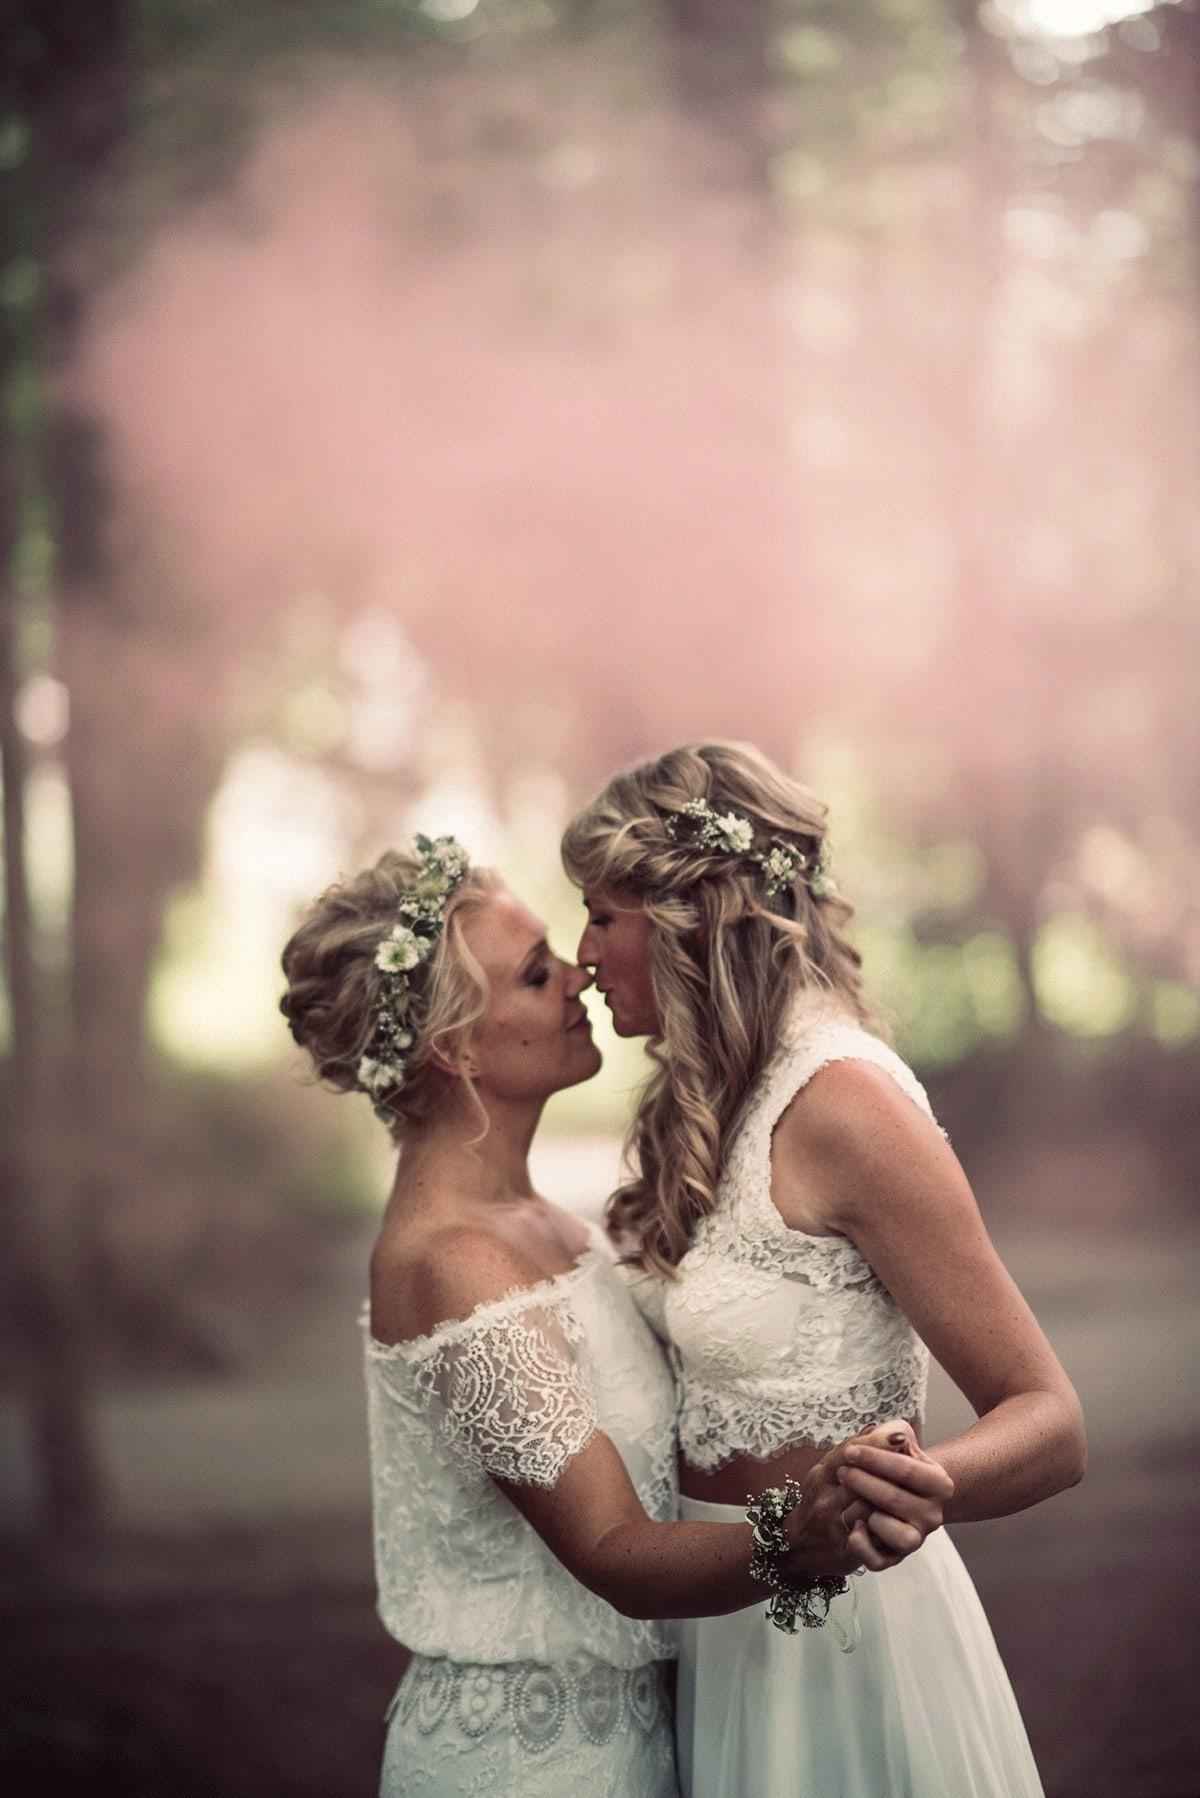 odizafotografie-bruidspaar-suzanne-en-stefanie-low-res-075